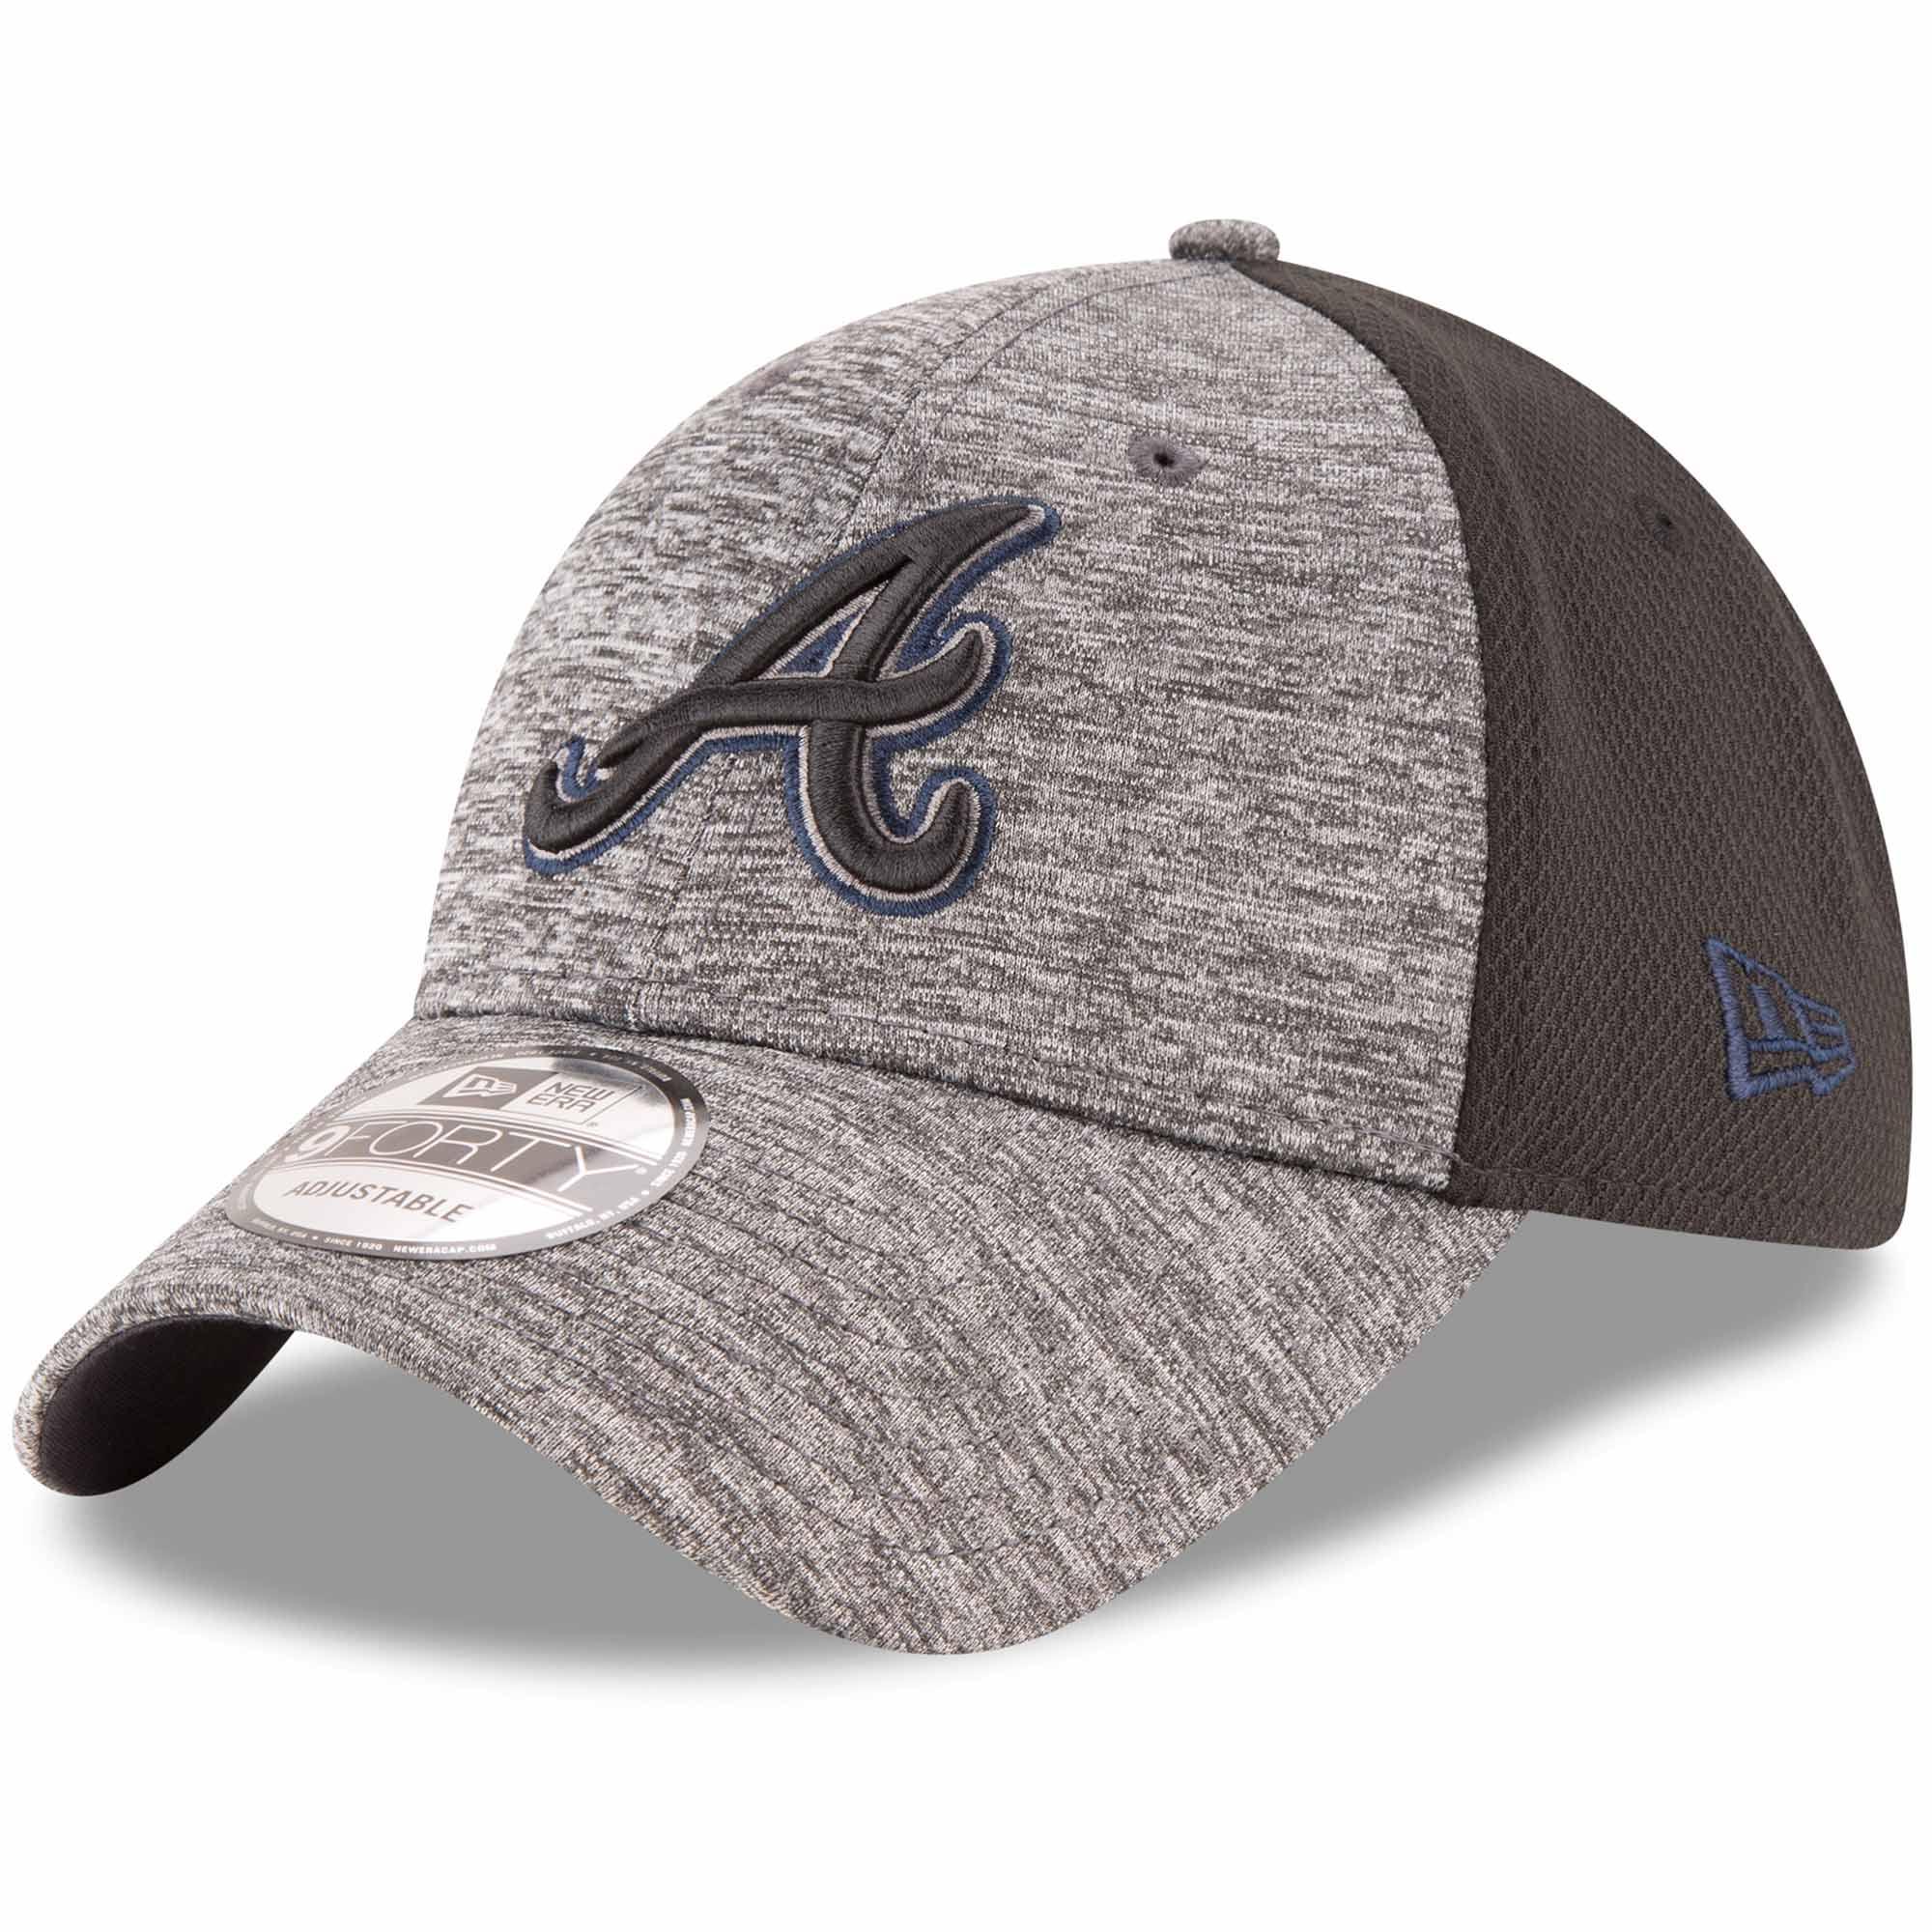 Atlanta Braves New Era Shadowed Team Logo 9FORTY Adjustable Hat - Heathered Gray/Black - OSFA